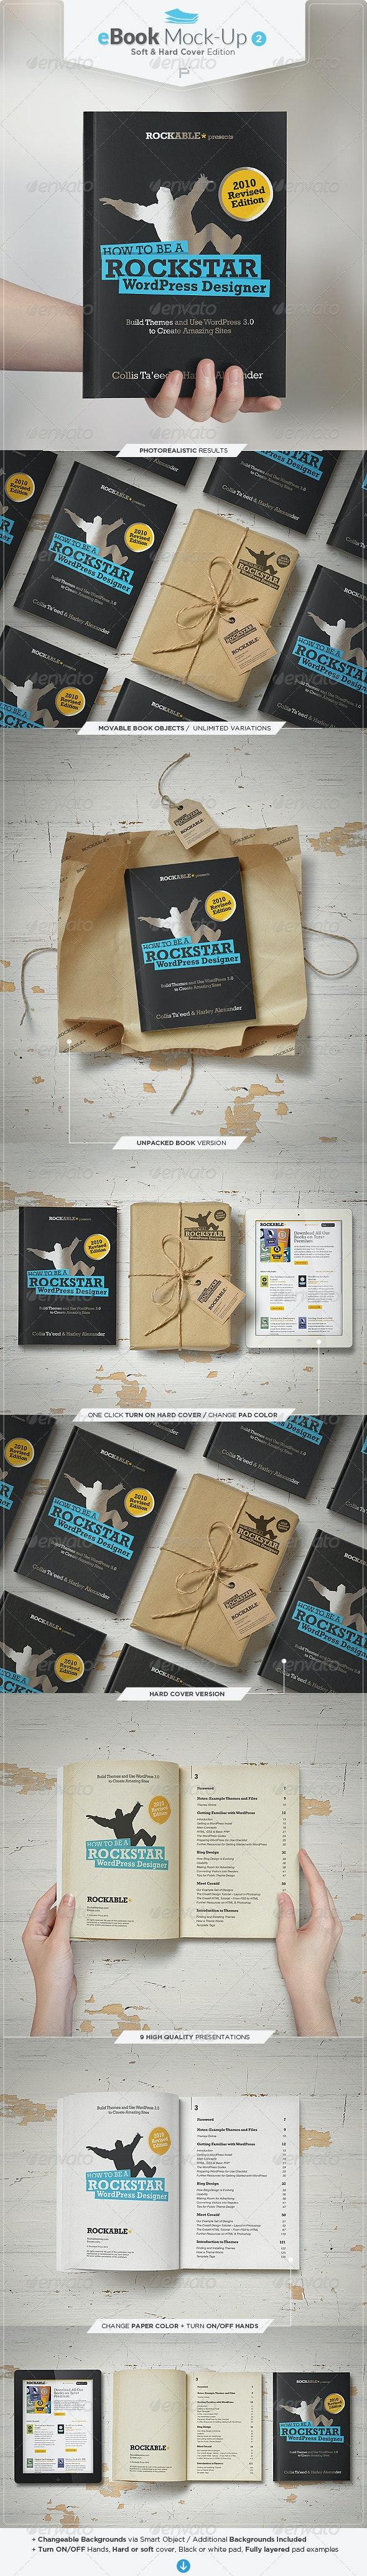 eBook Mock-Up Set 2 / Soft & Hard Cover Edition - Books Print